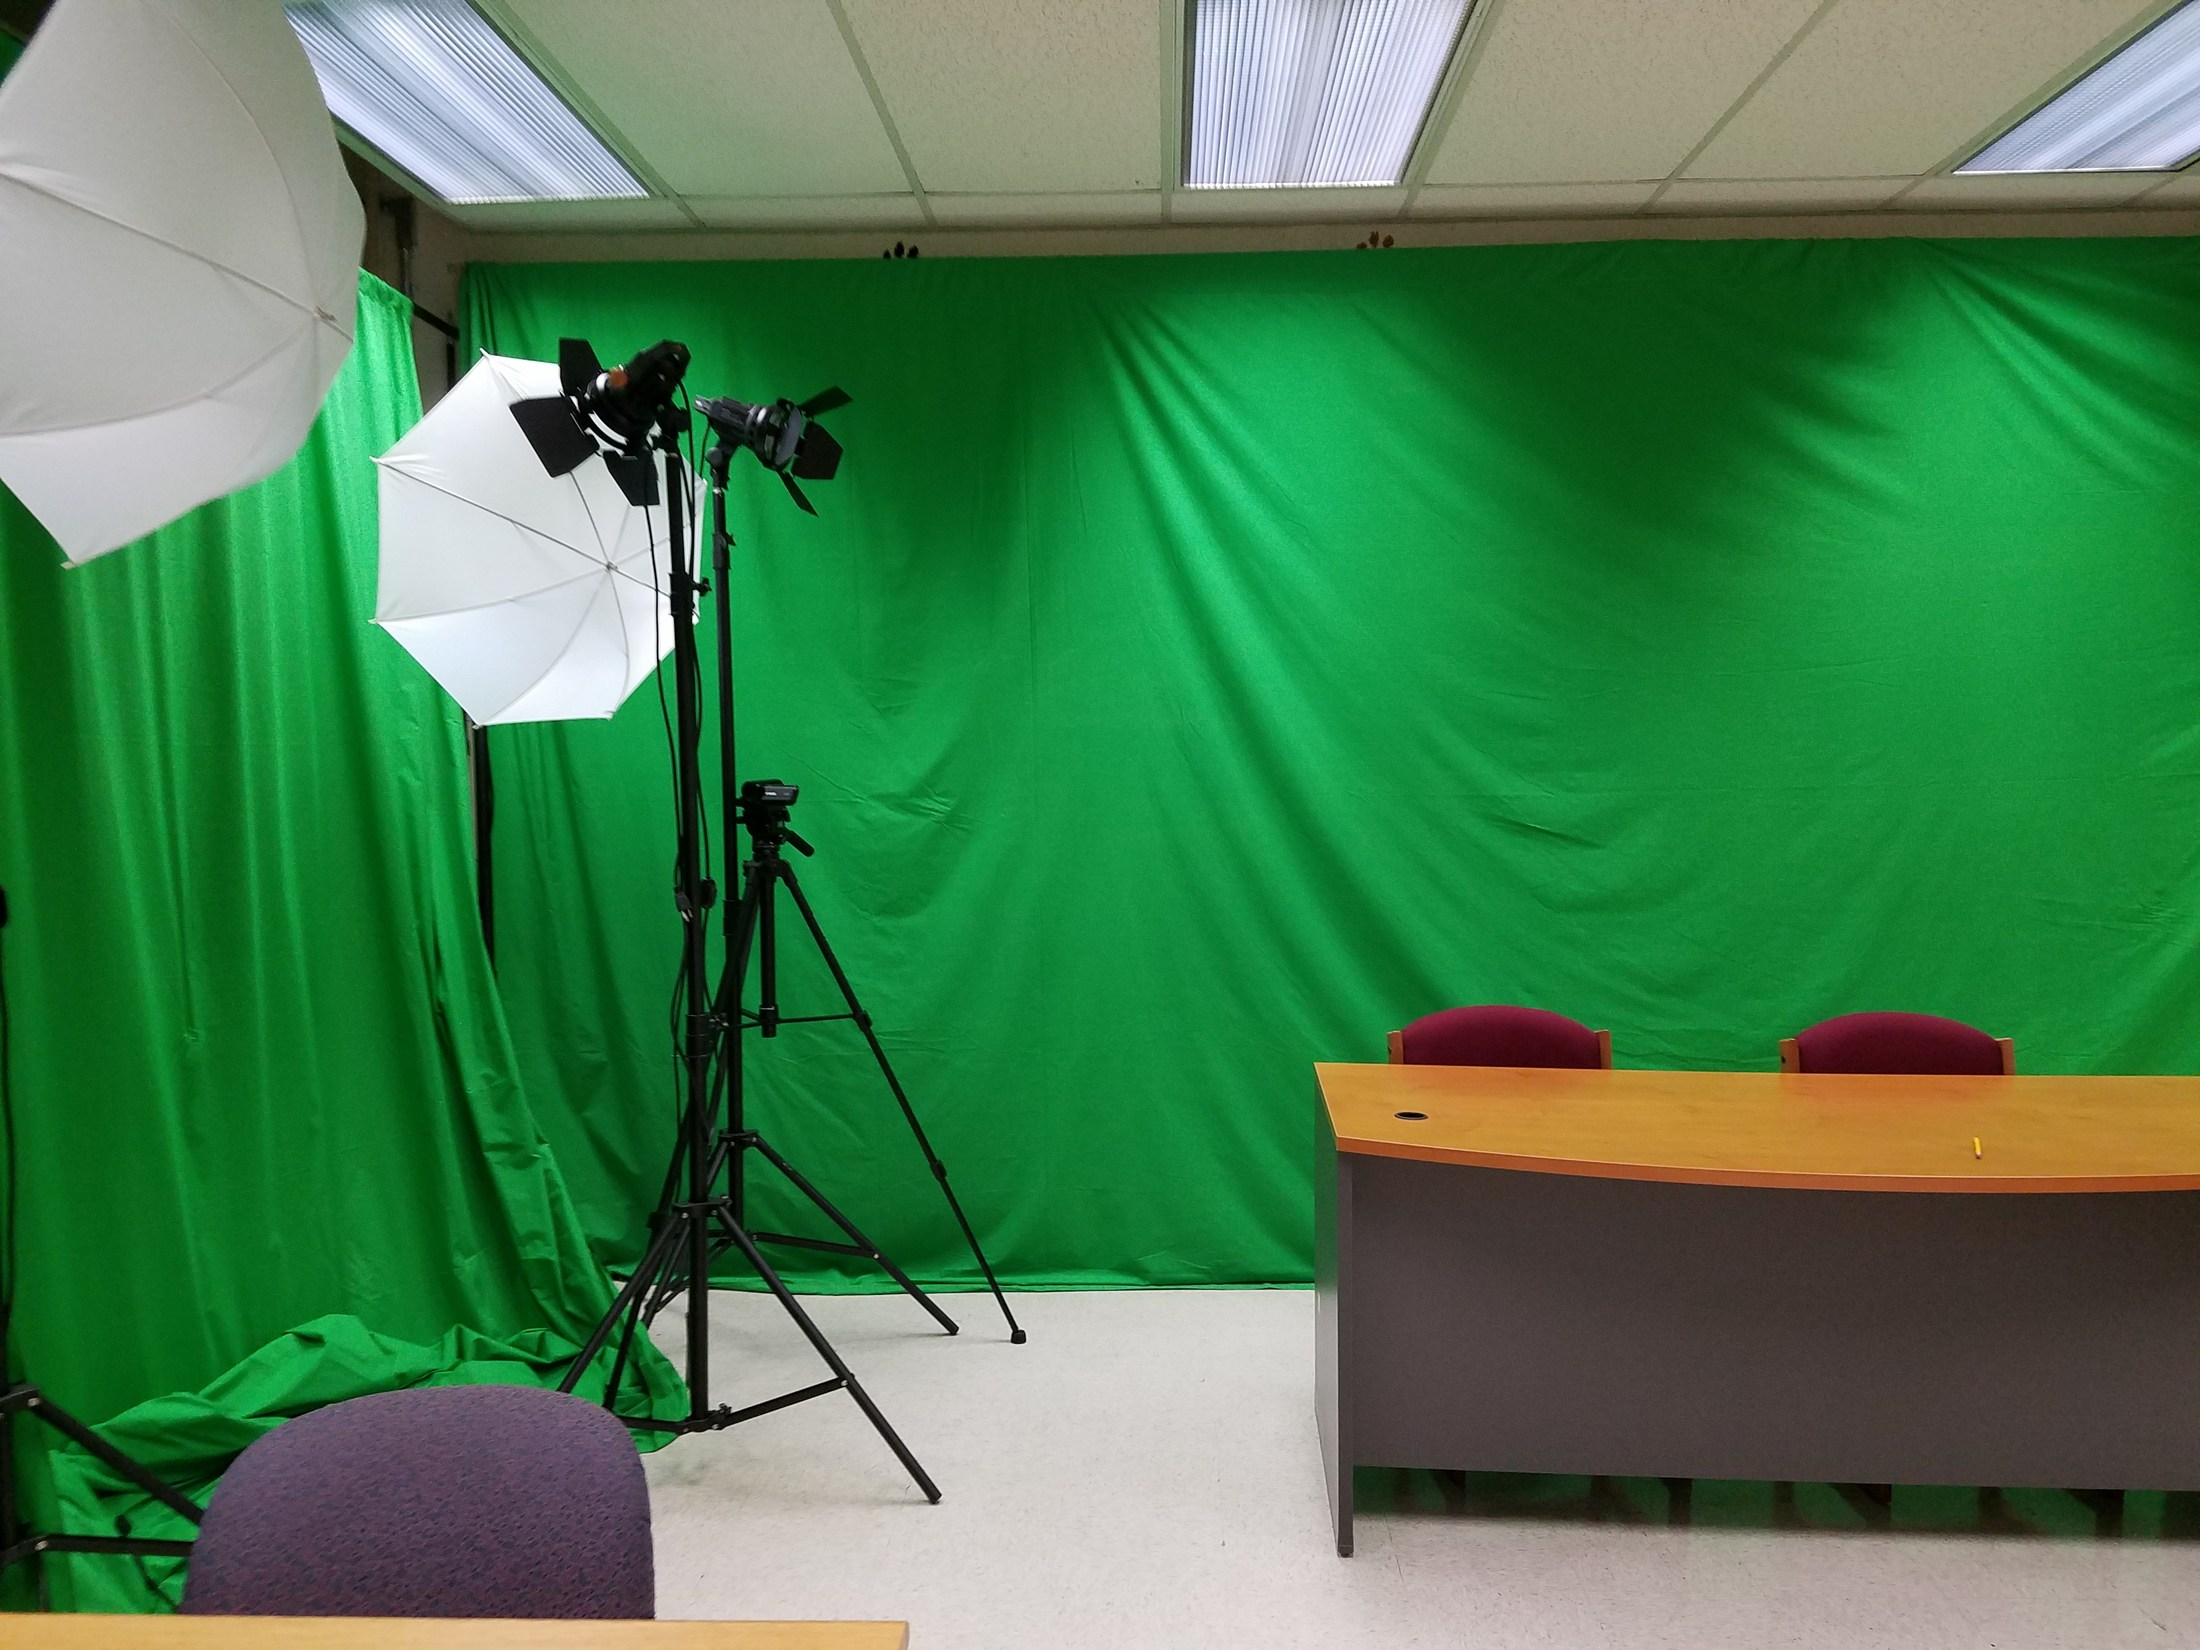 Digital film making room